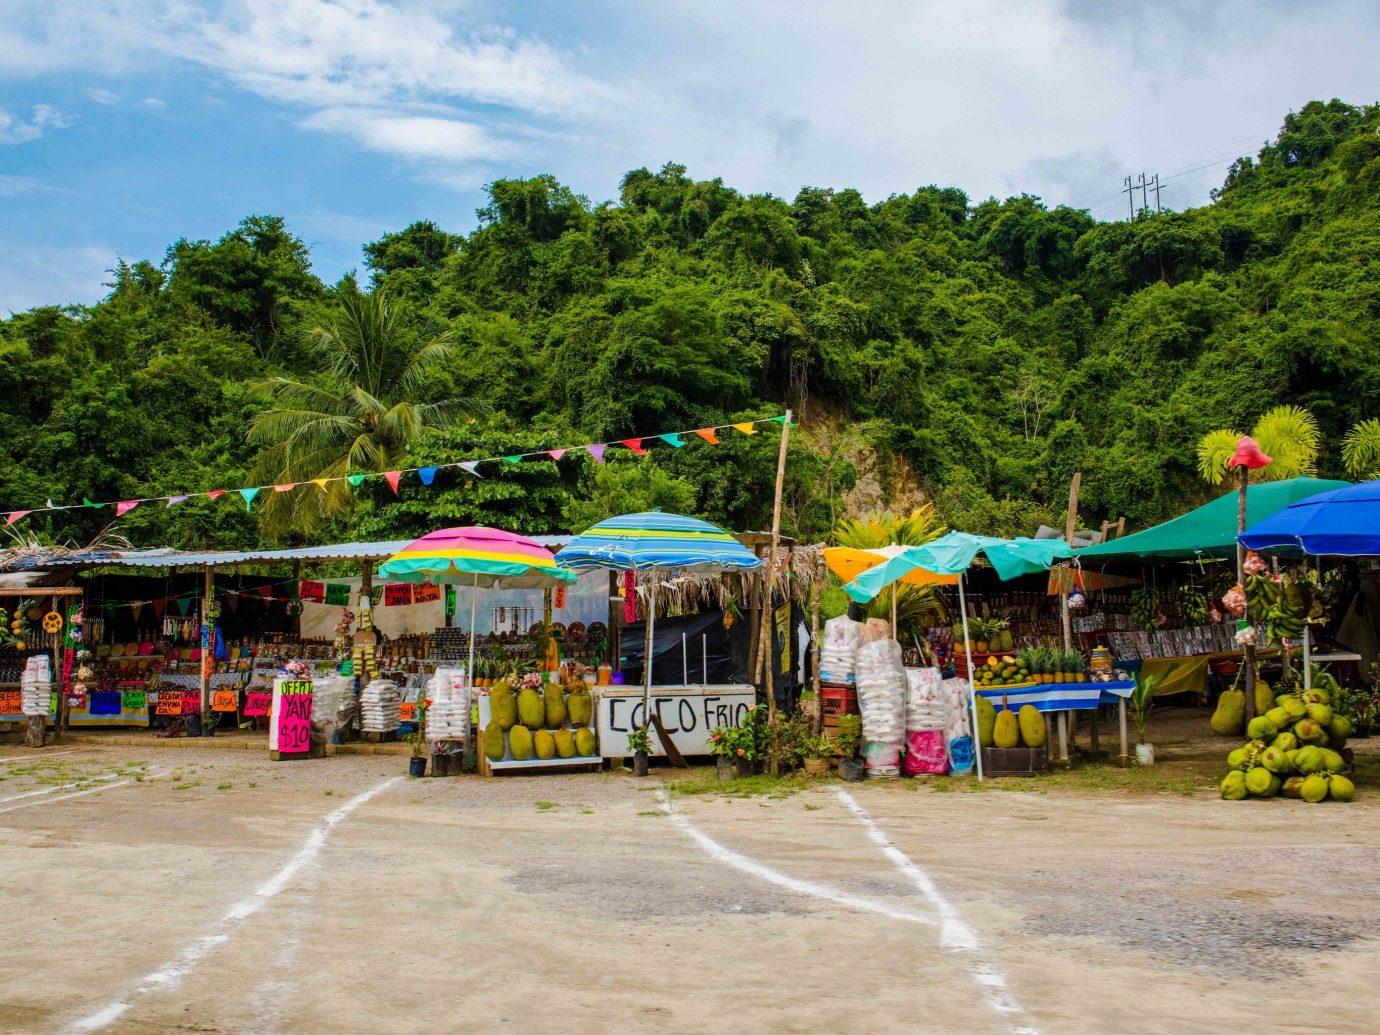 Food + Drink Mexico Puerto Vallarta sky tree plant leisure tourism City fair recreation Beach water vacation landscape fun